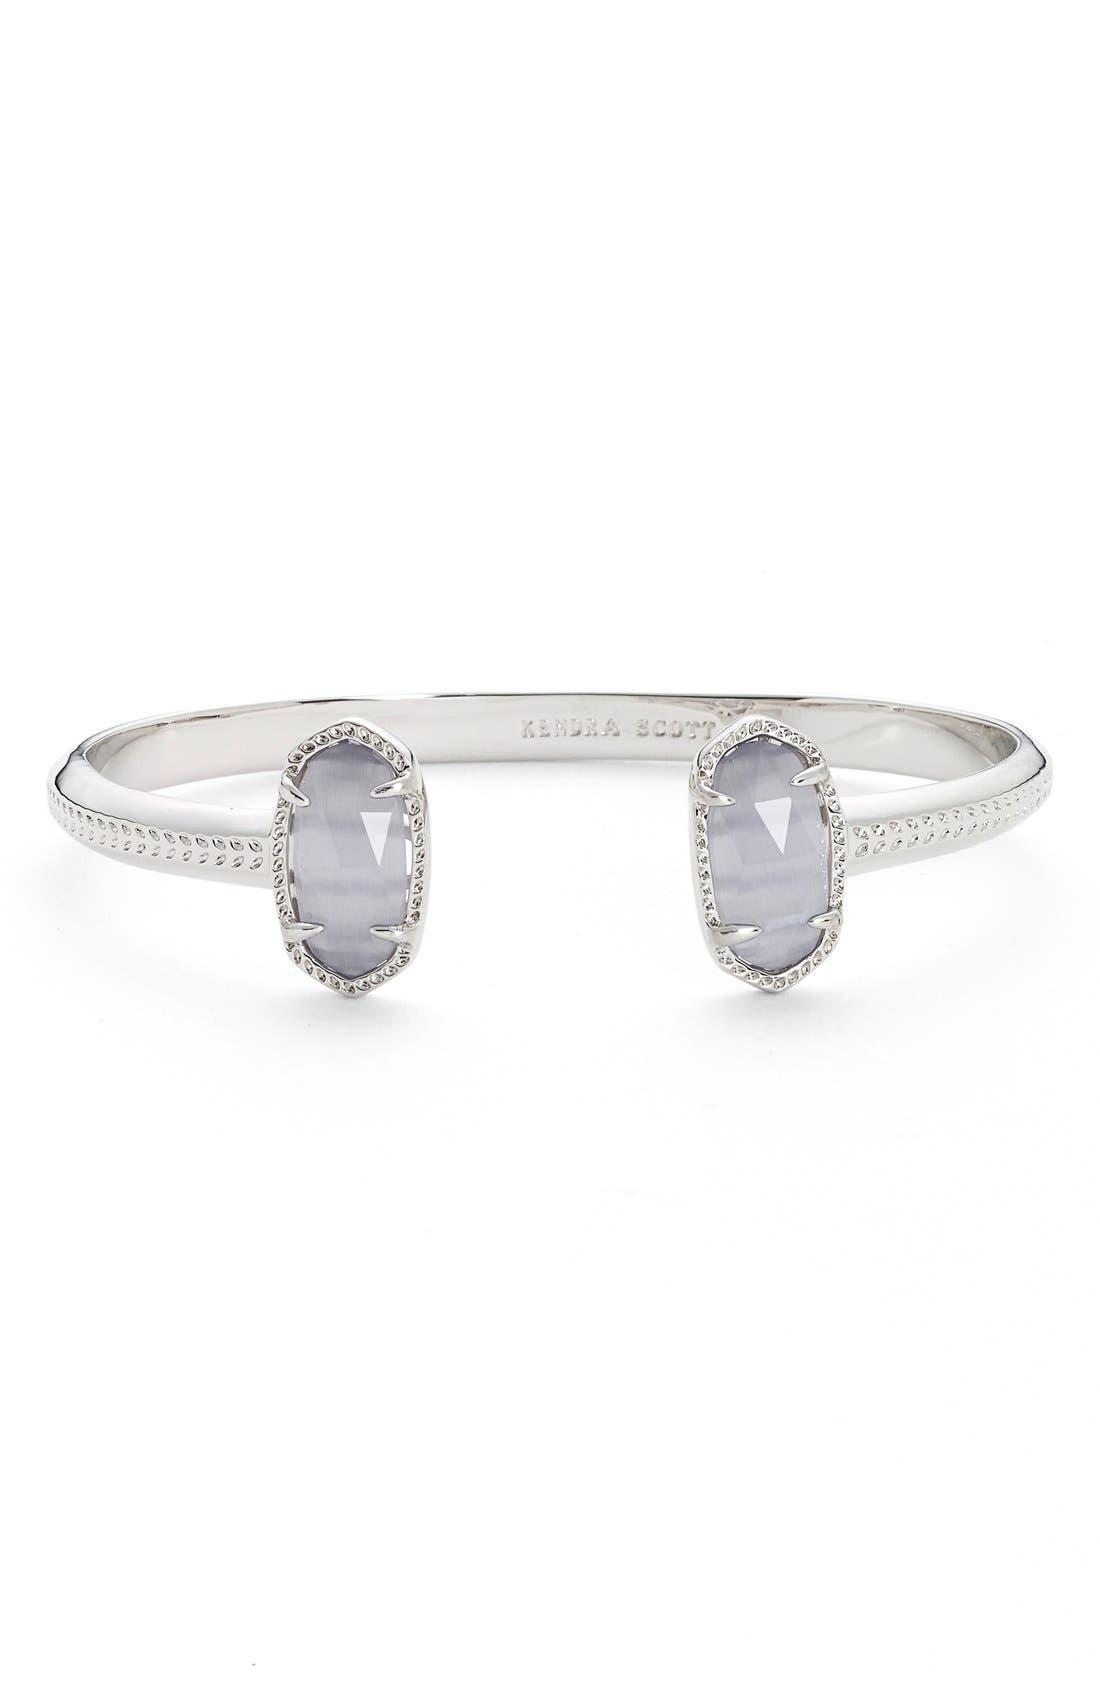 KENDRA SCOTT 'Elton' Station Cuff Bracelet